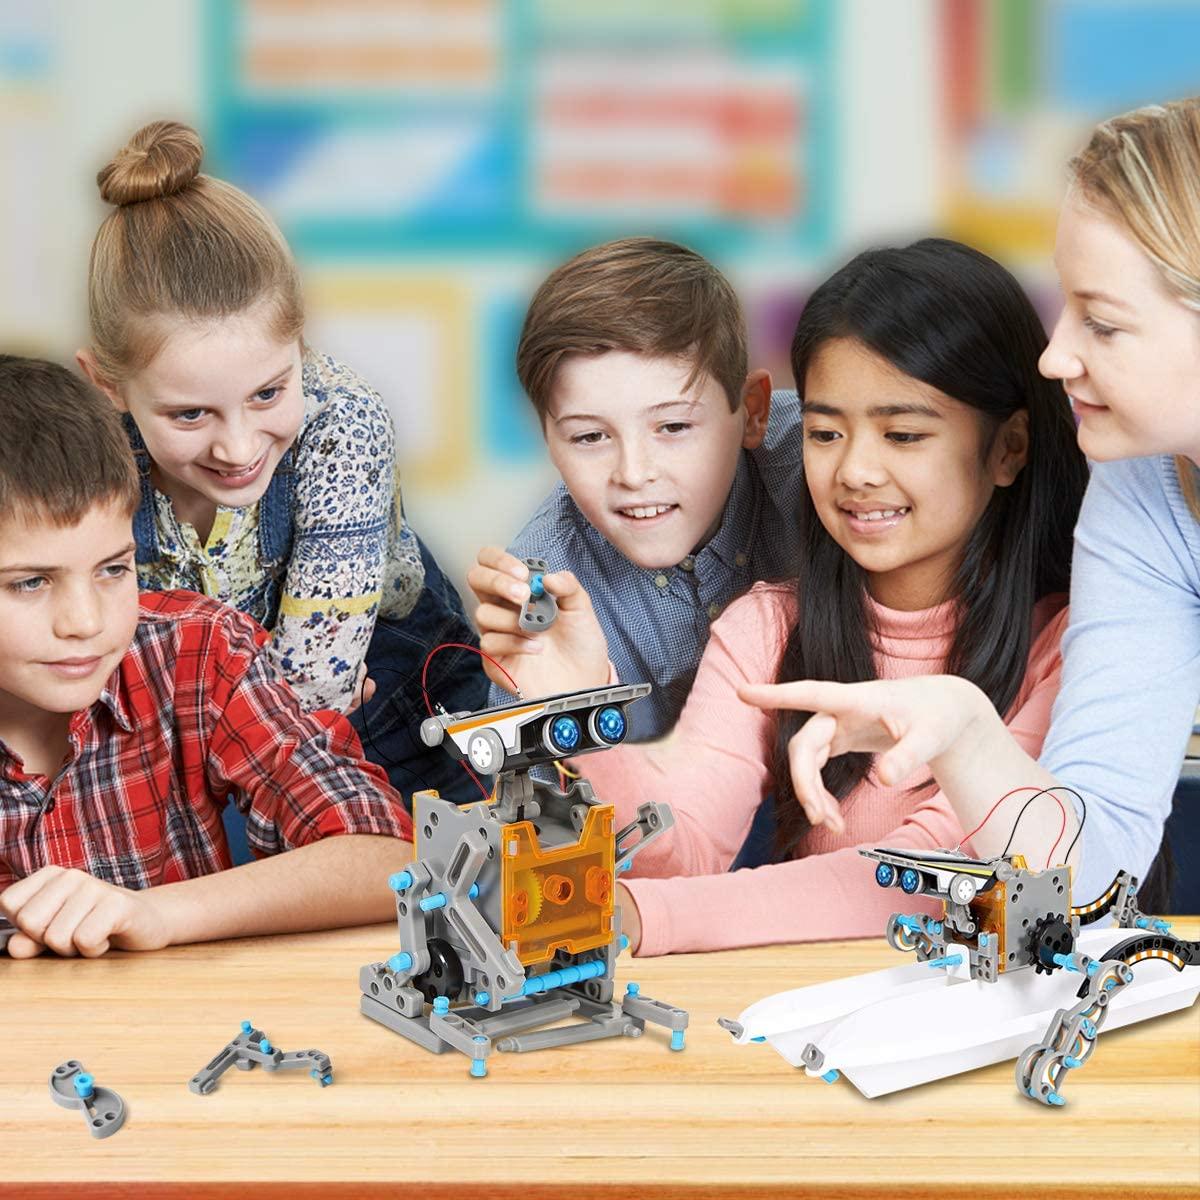 Educational Robotics Kits